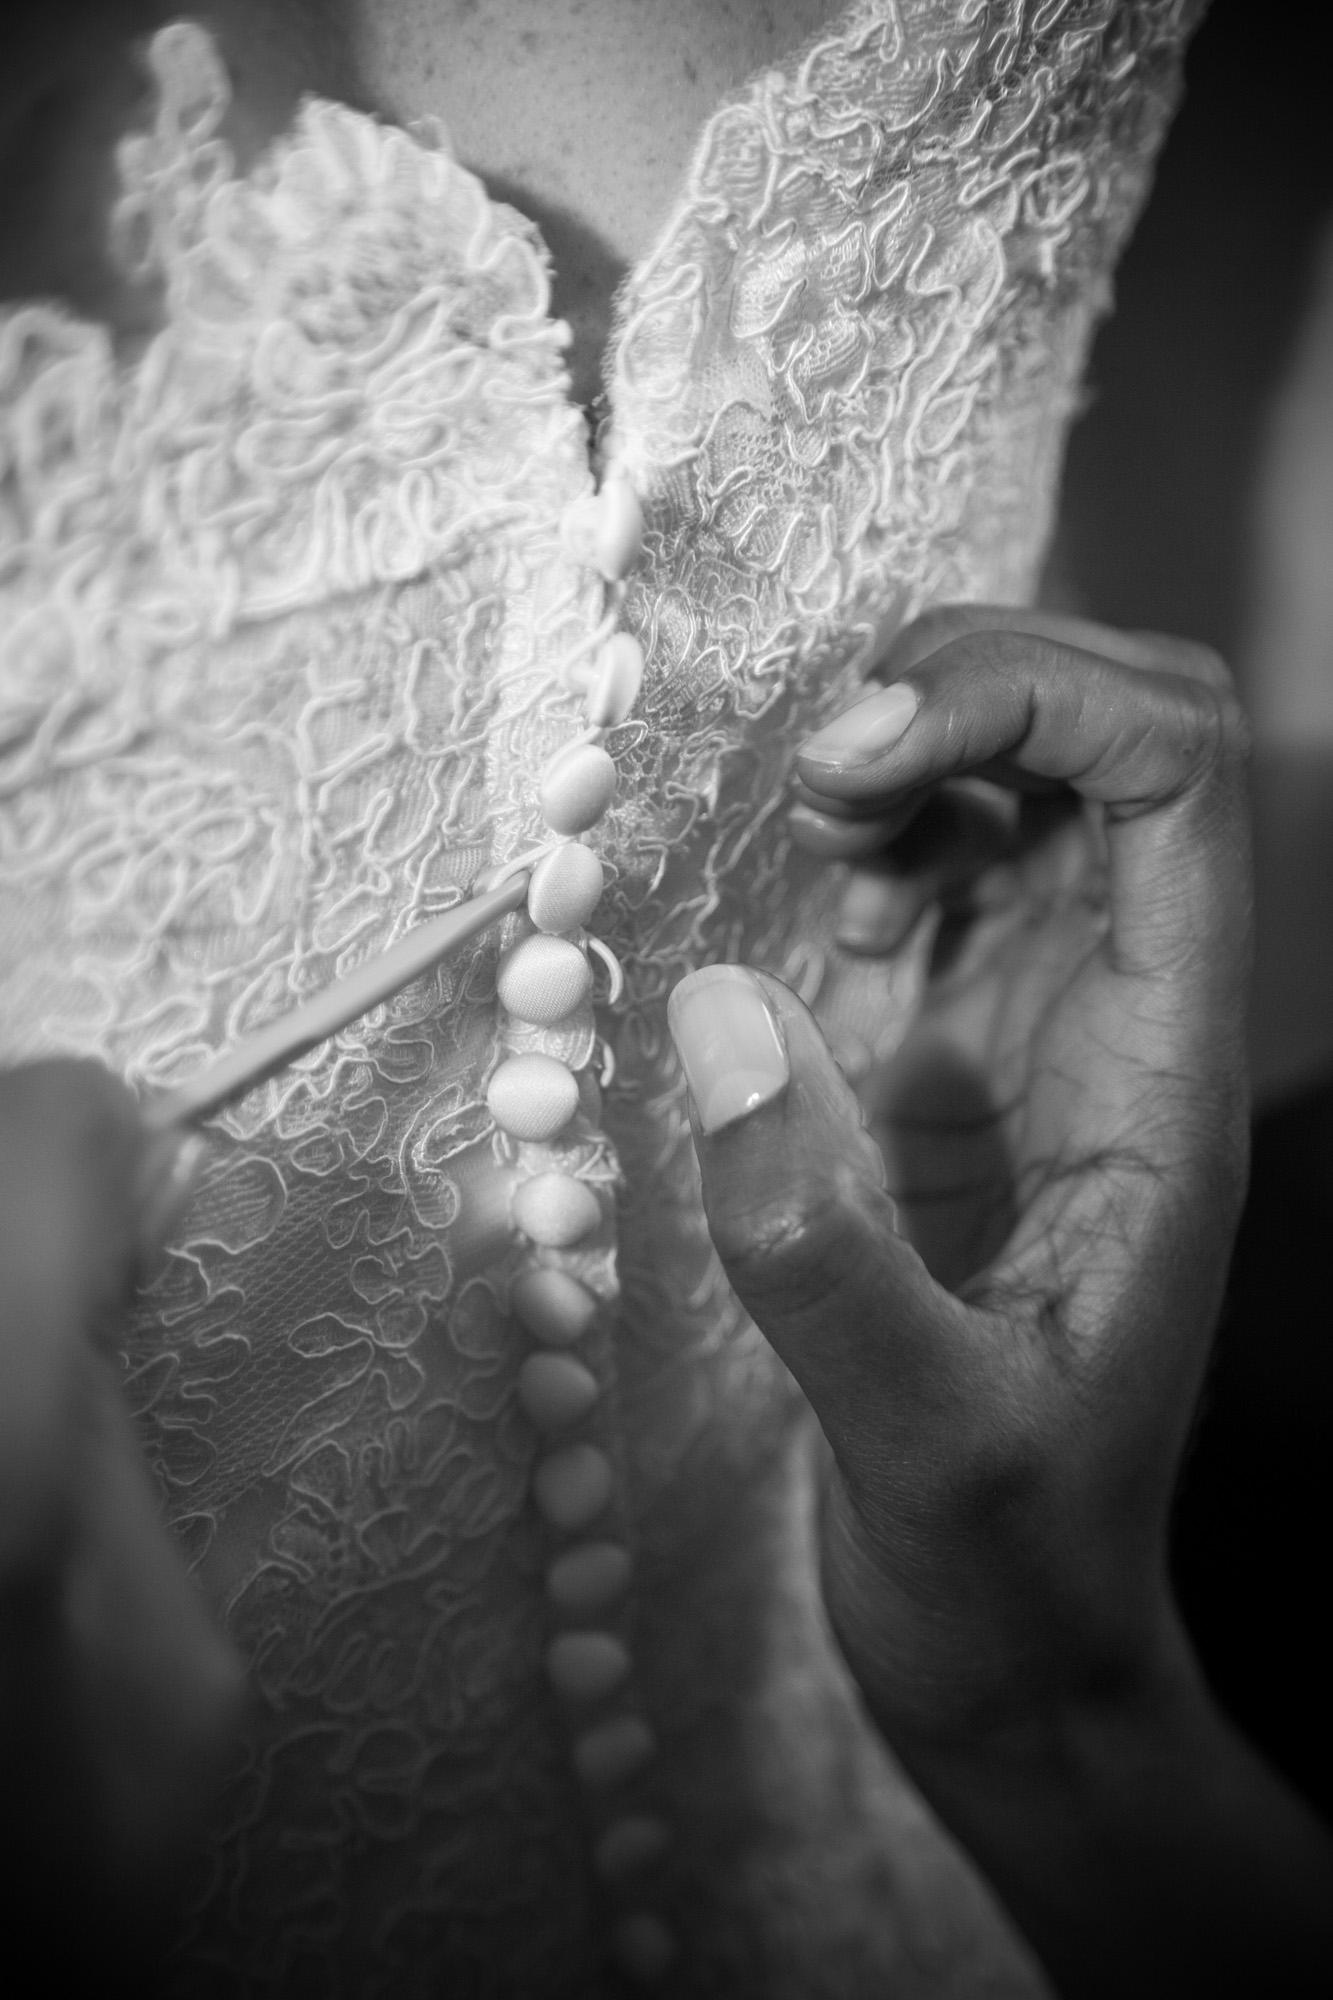 weddings-couples-love-photographer-oxford-london-jonathan-self-photography-8.jpg